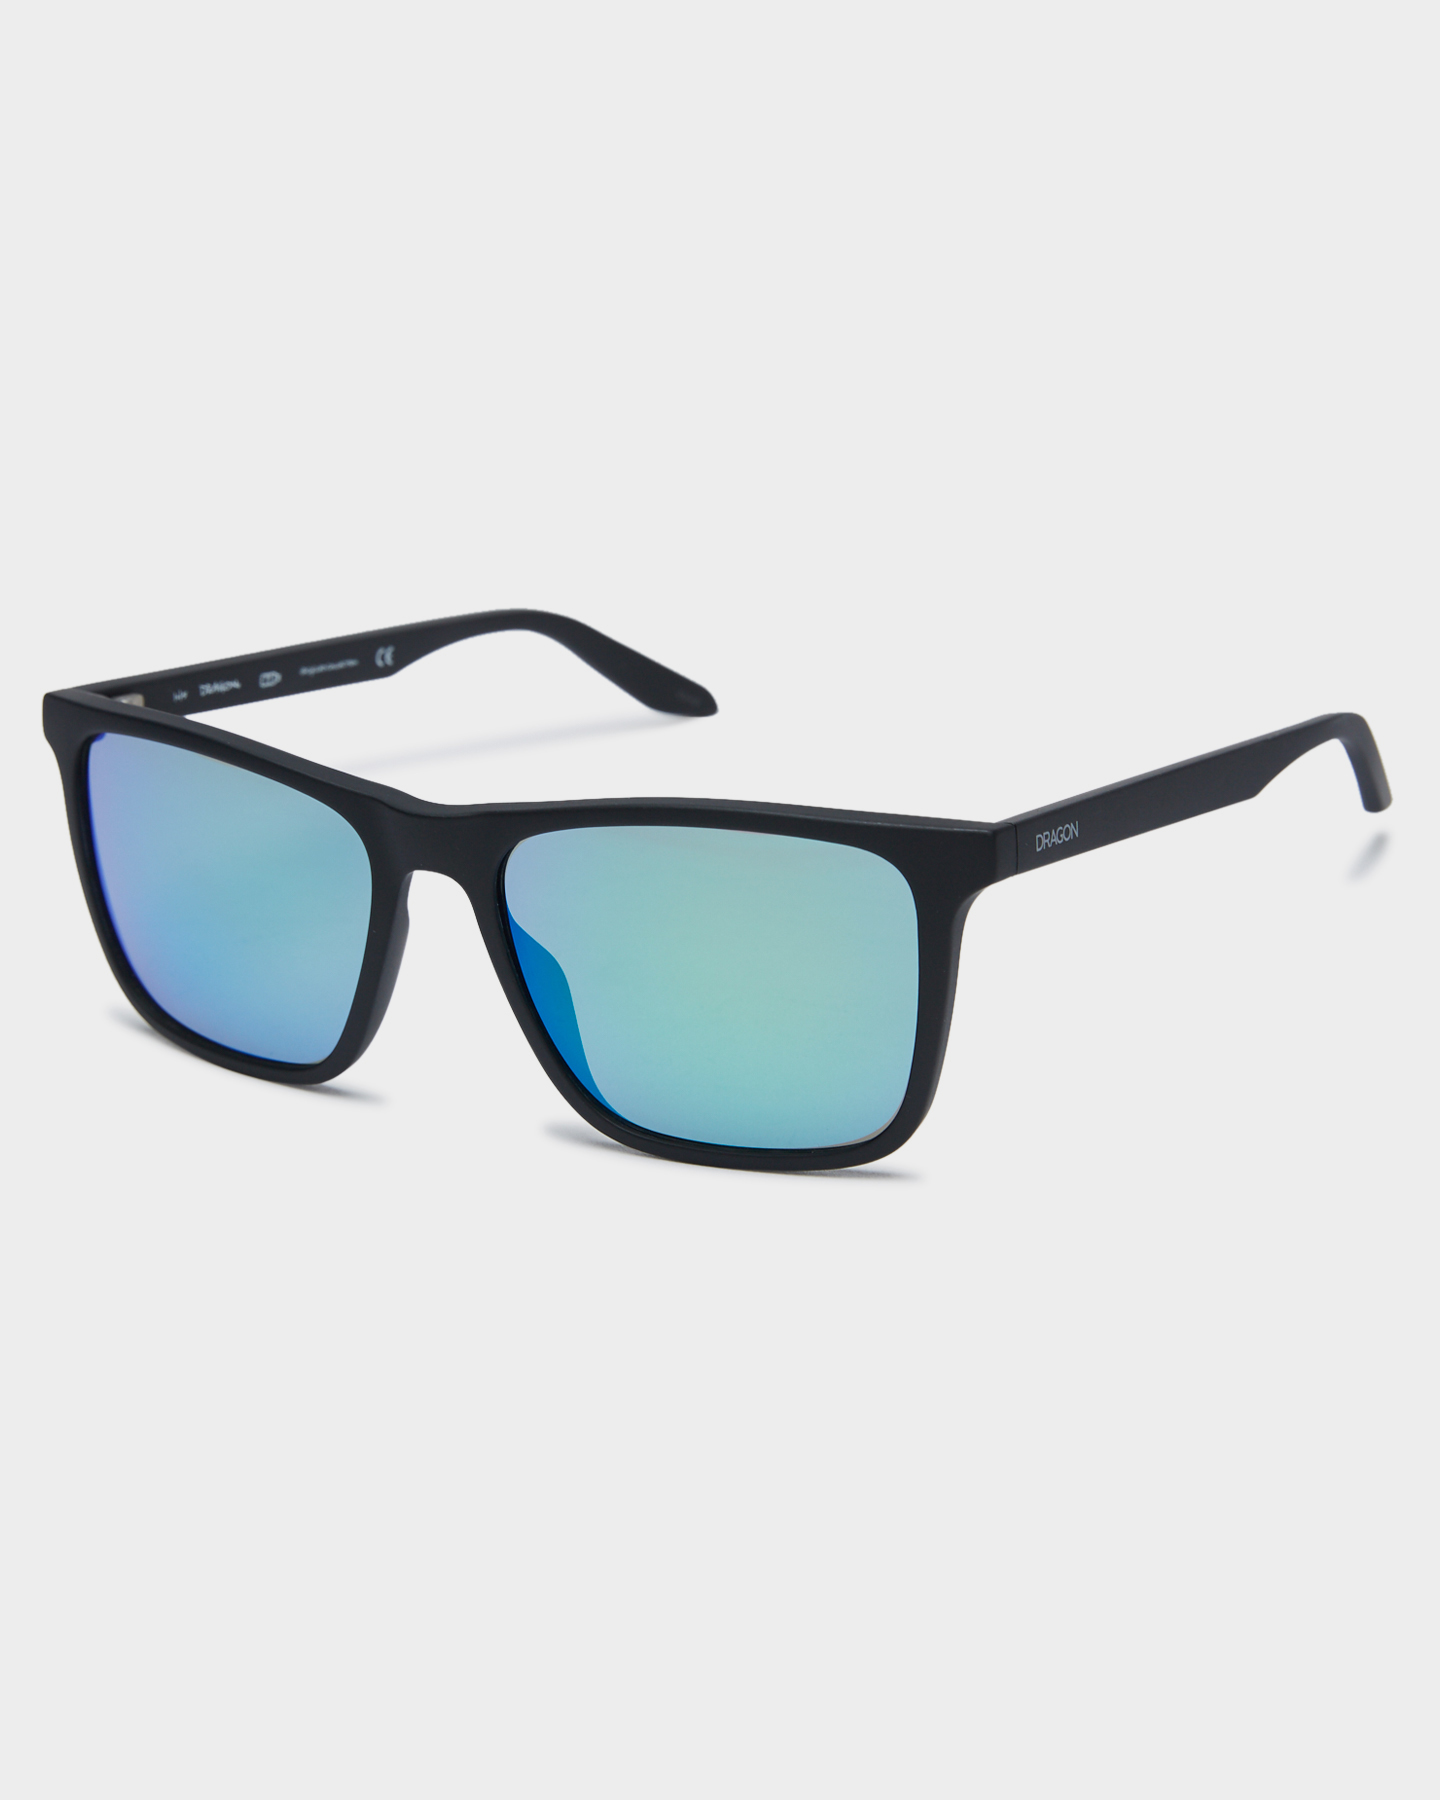 Dragon Renew Sunglasses Matte Blk Green Ion Matte Blk Green Ion